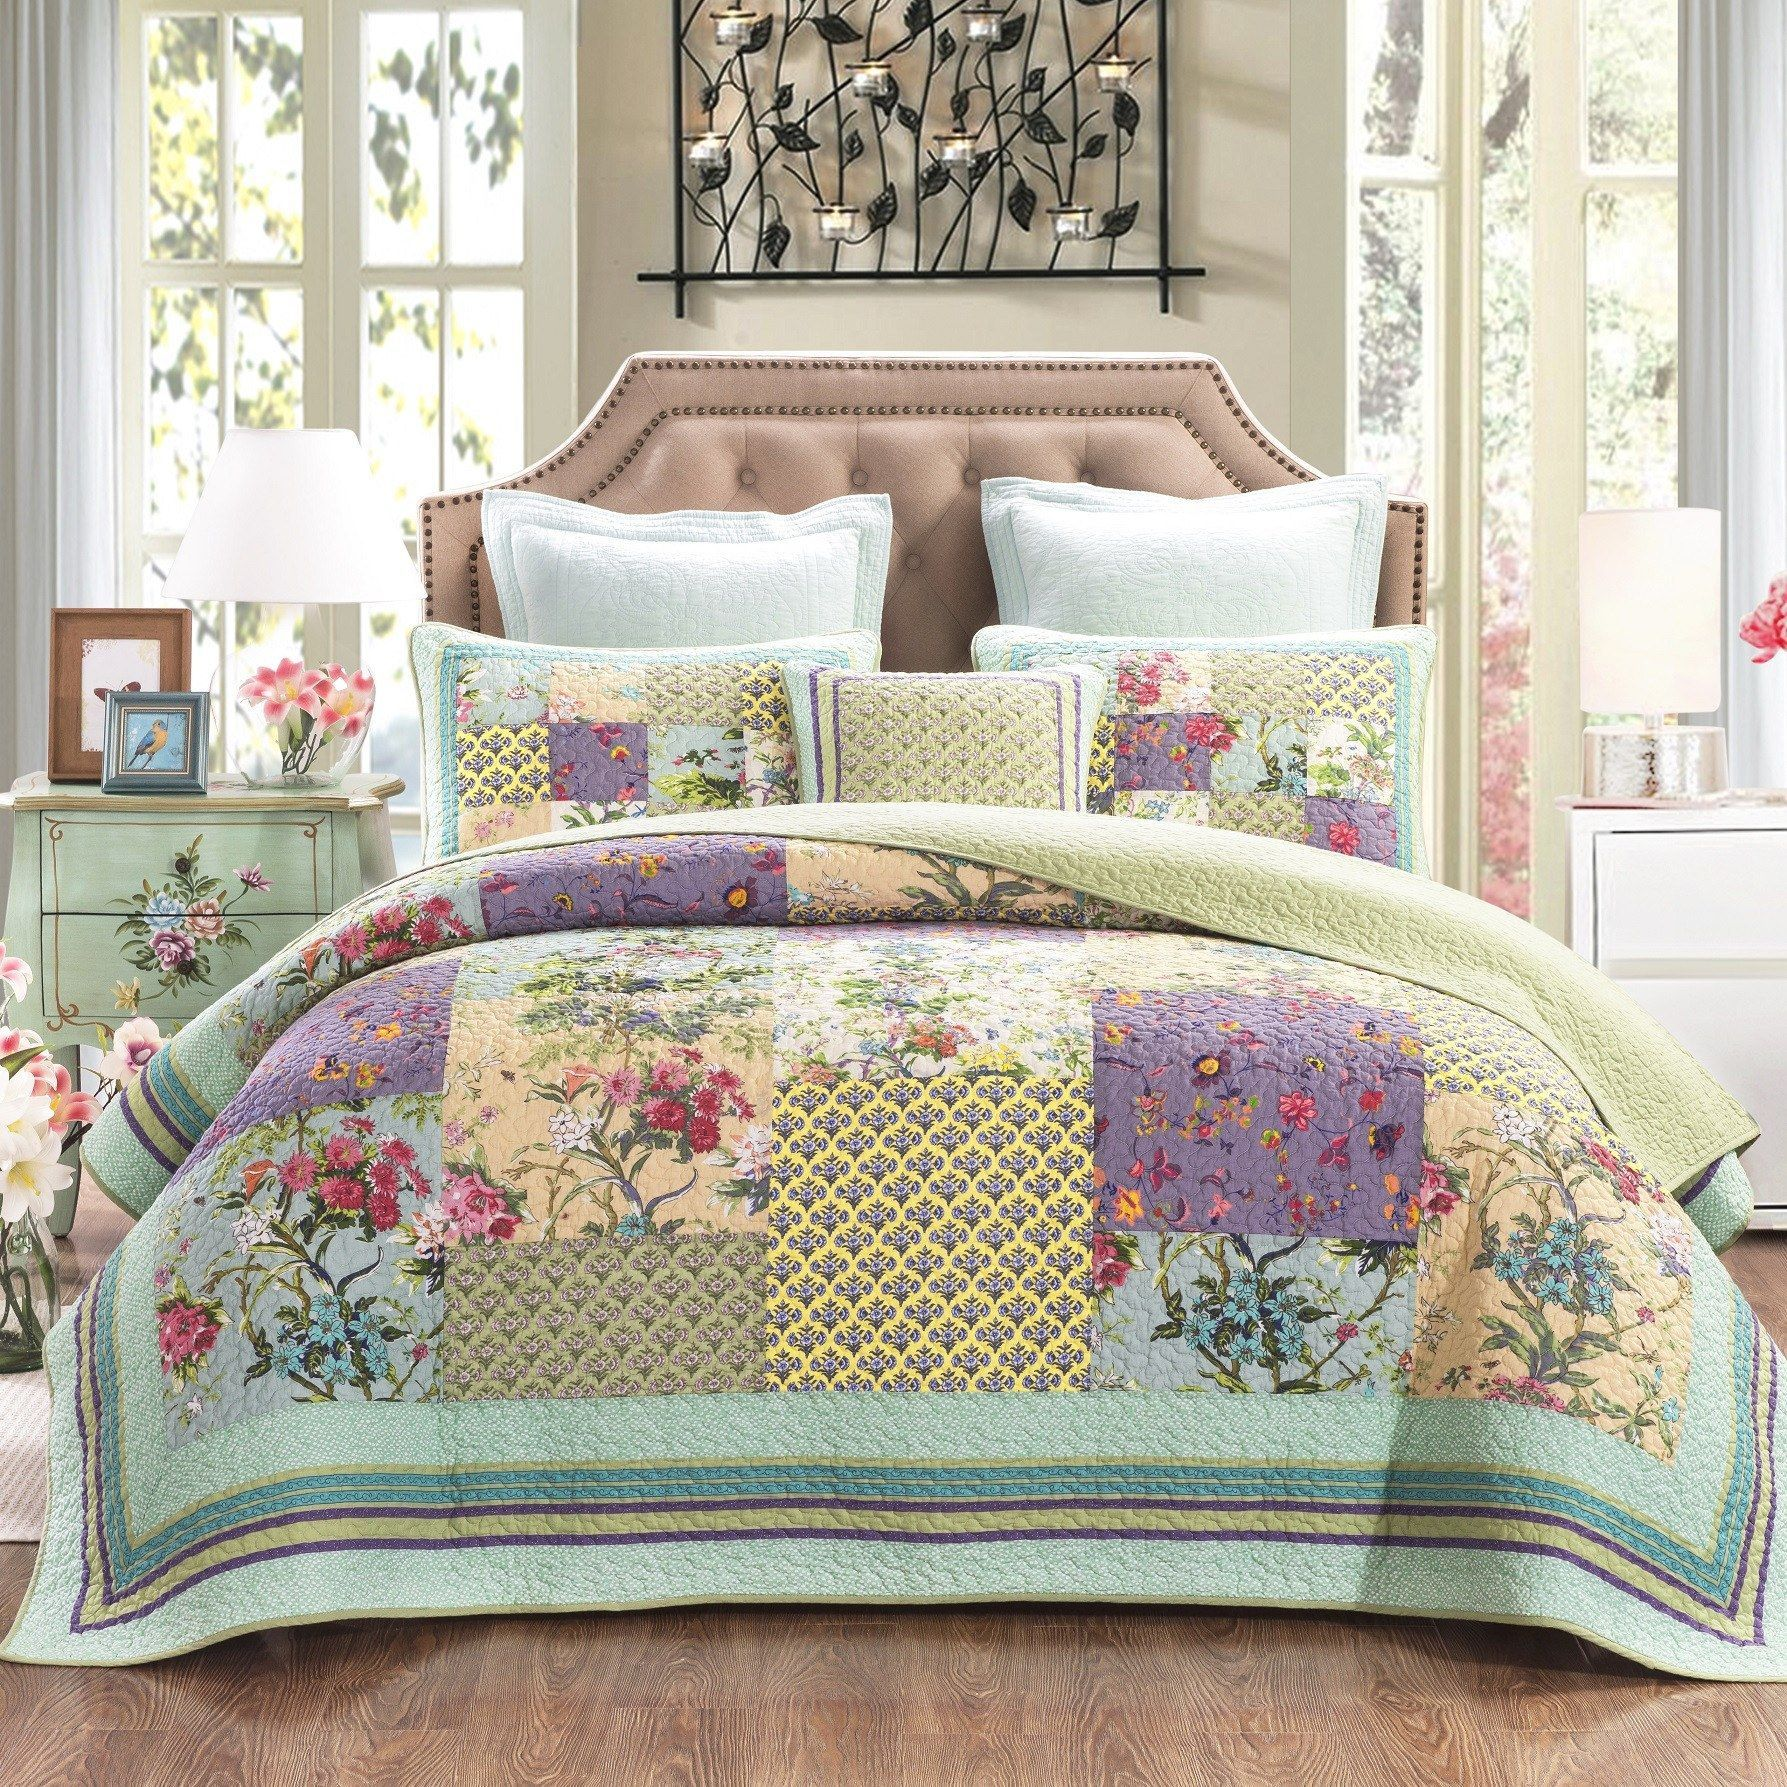 Enjoy The Vibrantly Beautiful Multi Colorful Shades Of Light Blue